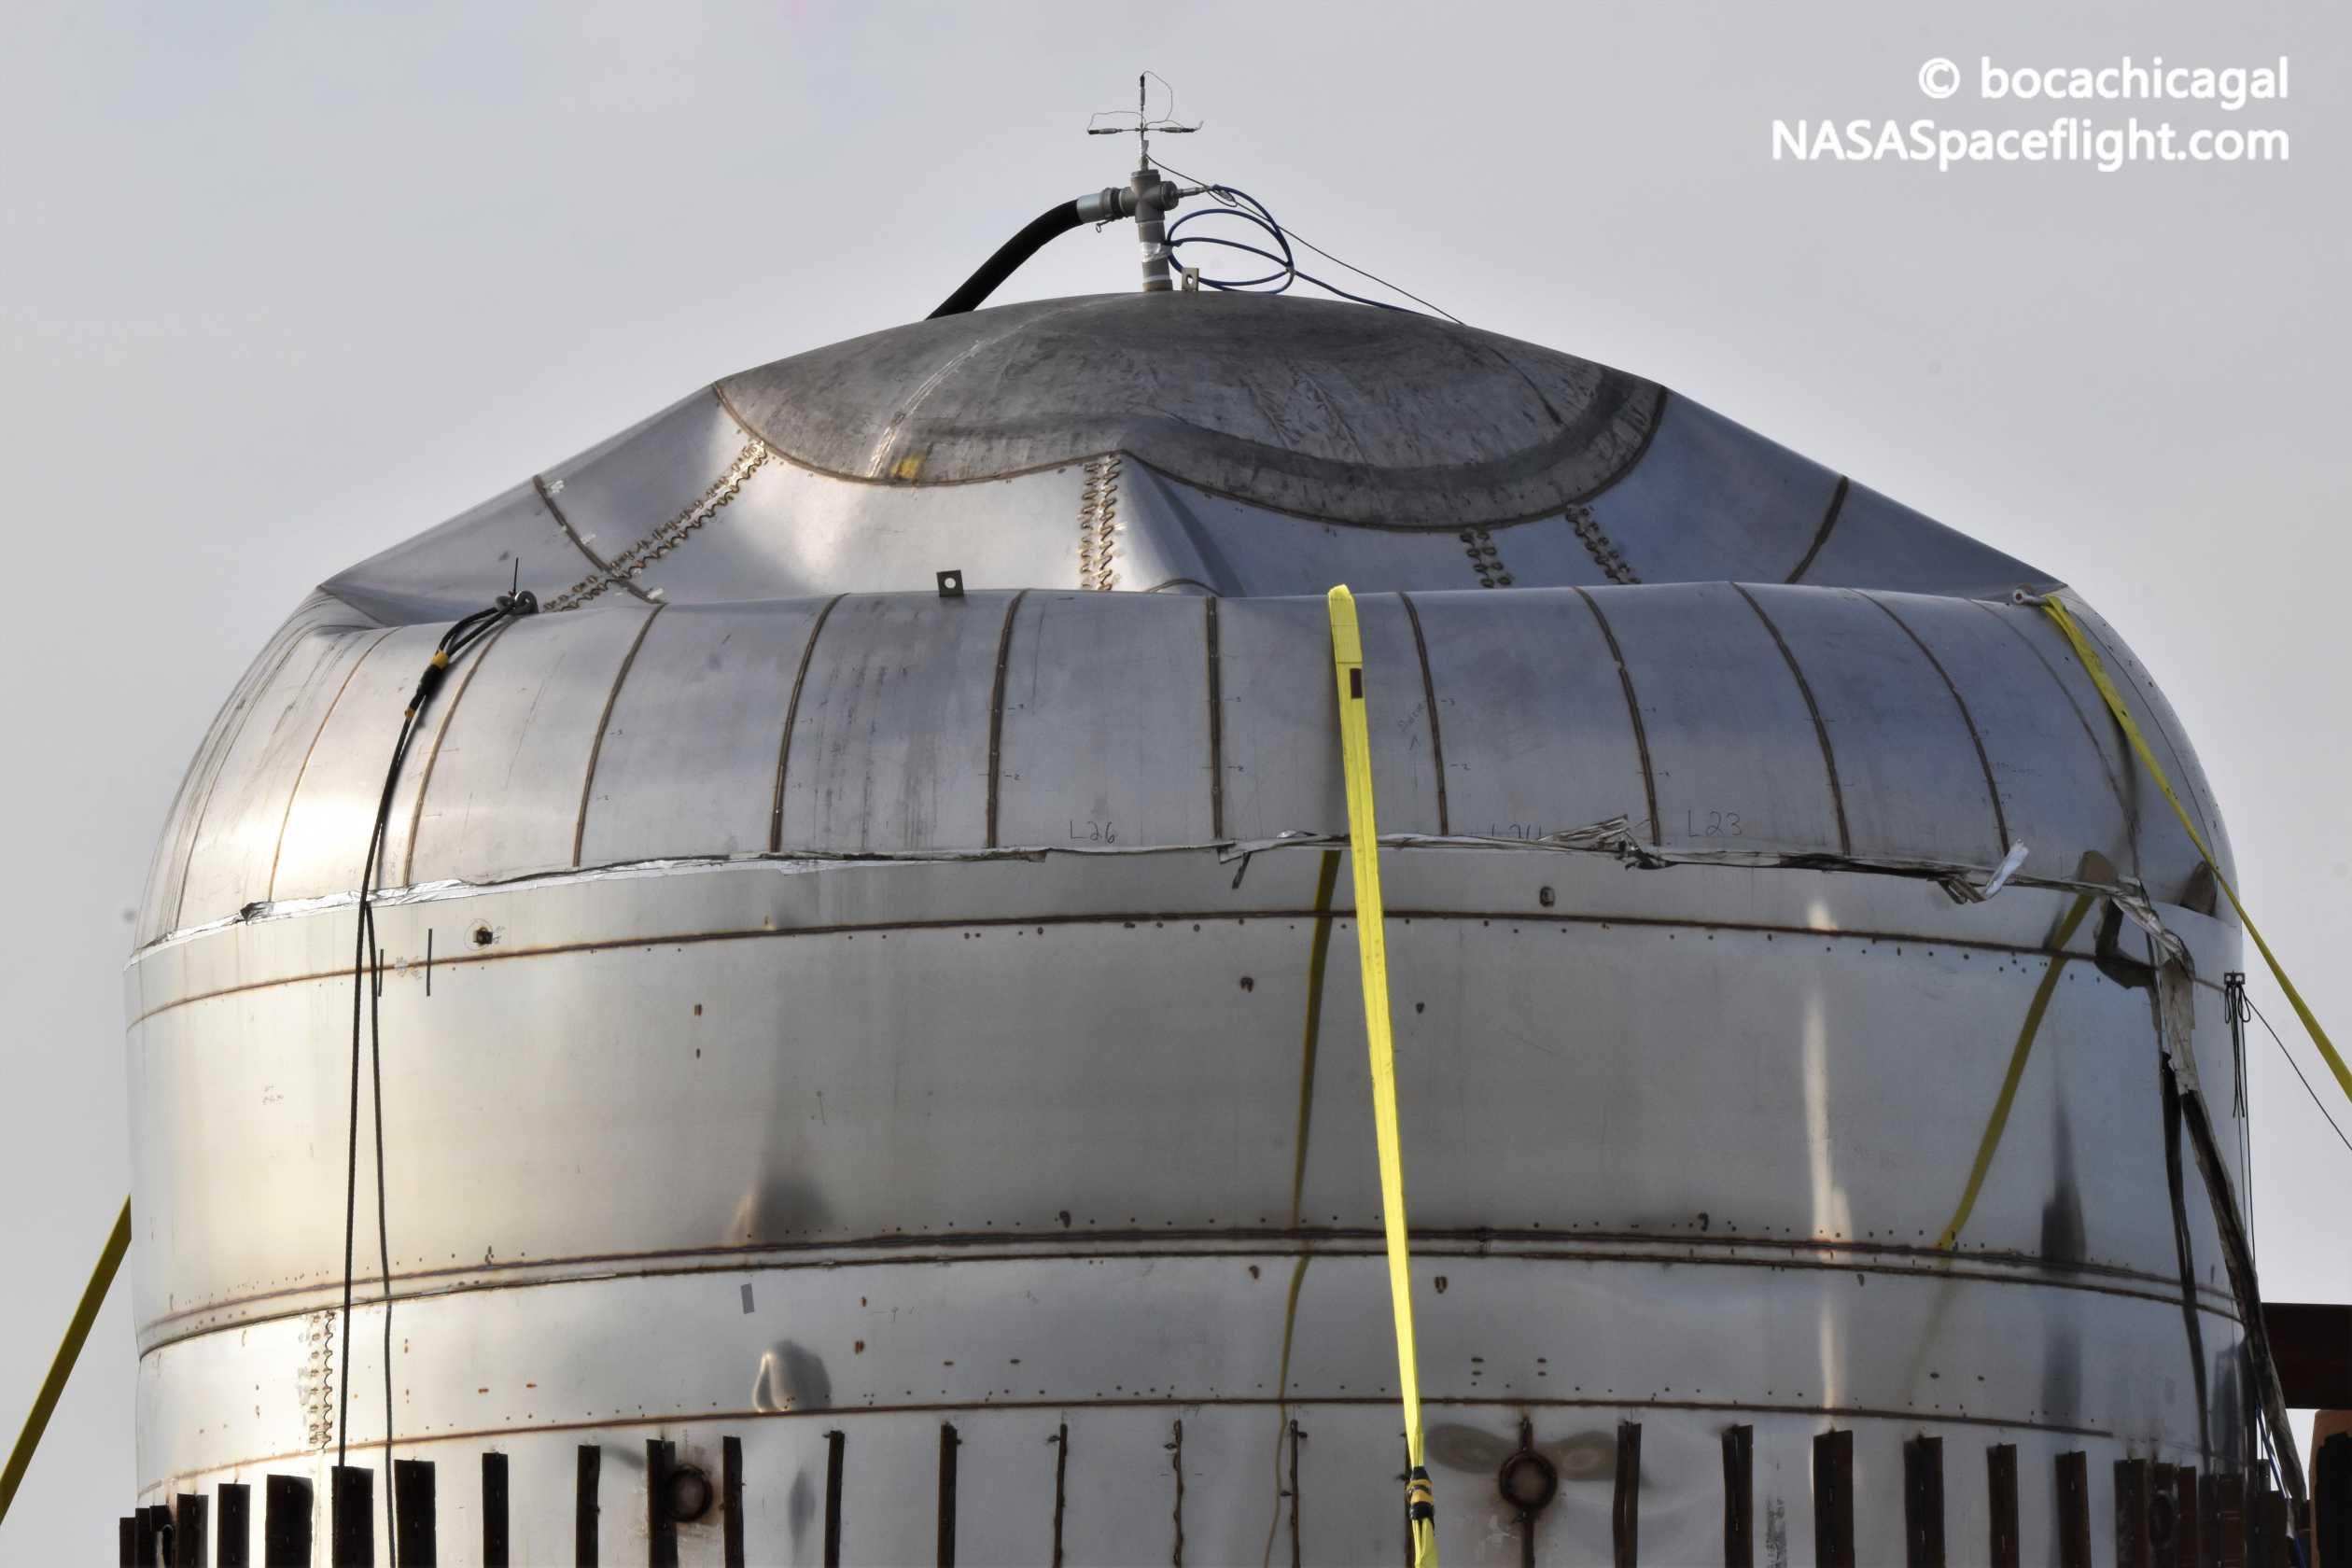 Starship Boca Chica 011020 (NASASpaceflight – bocachicagal) tank post test 5 (c)